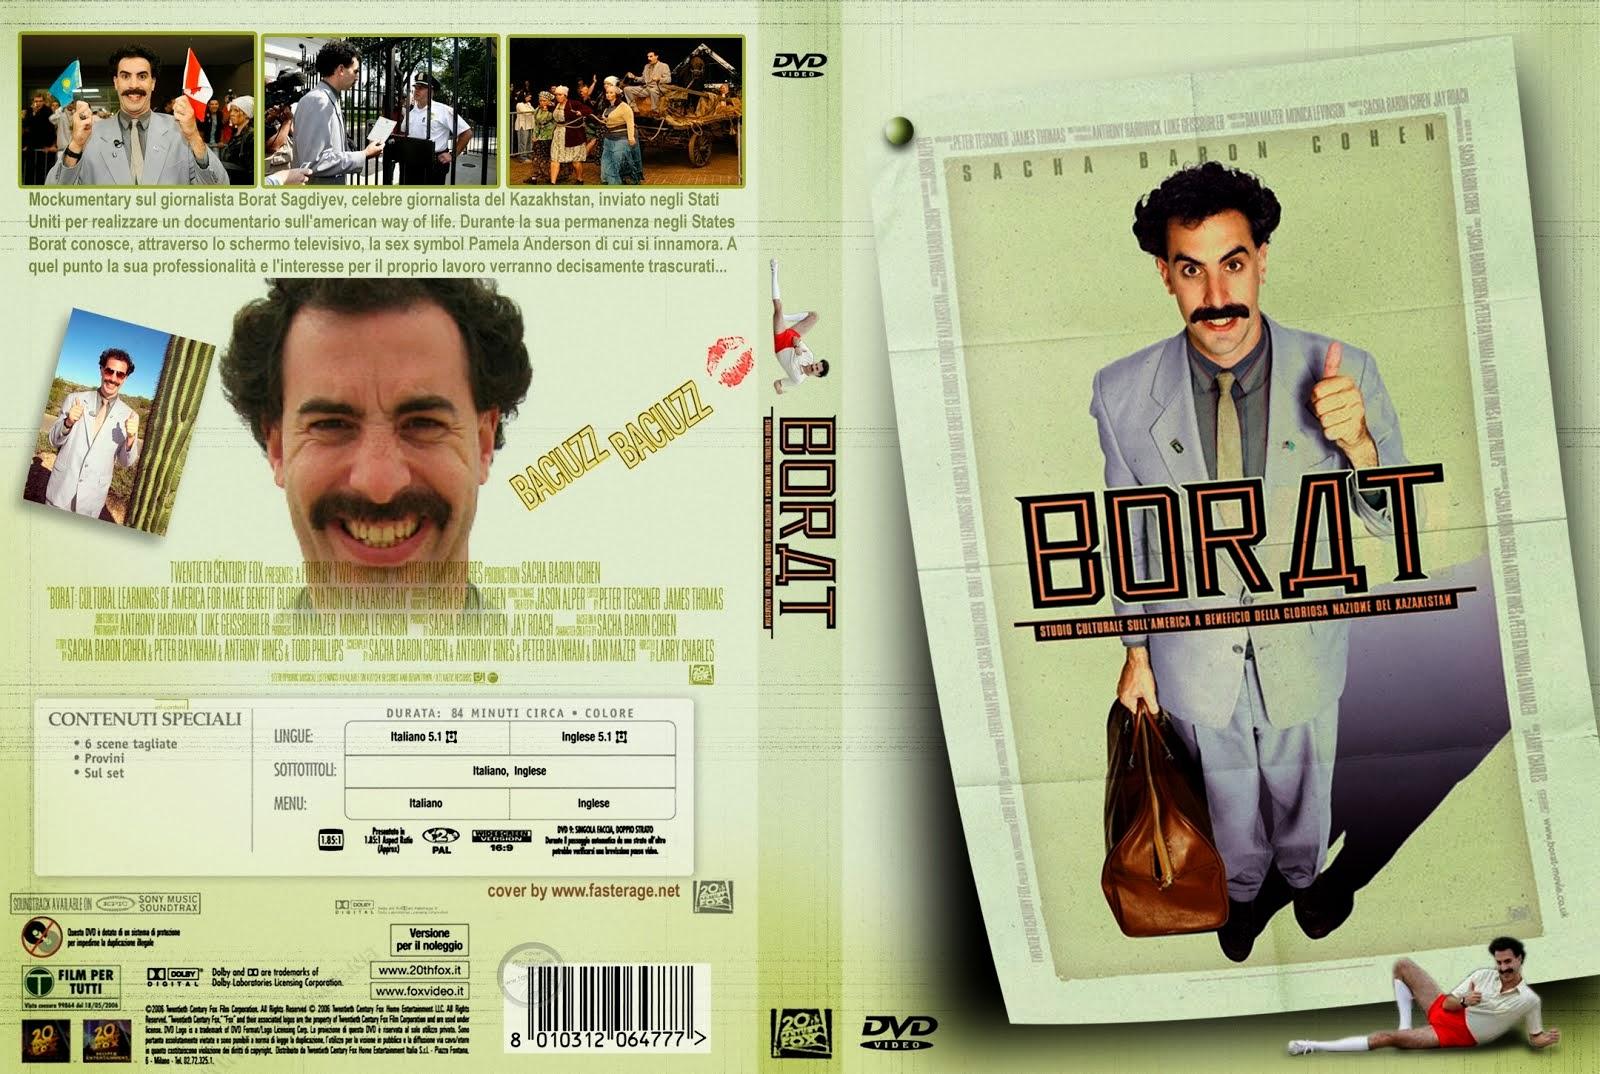 1059º - BORAT (2006)